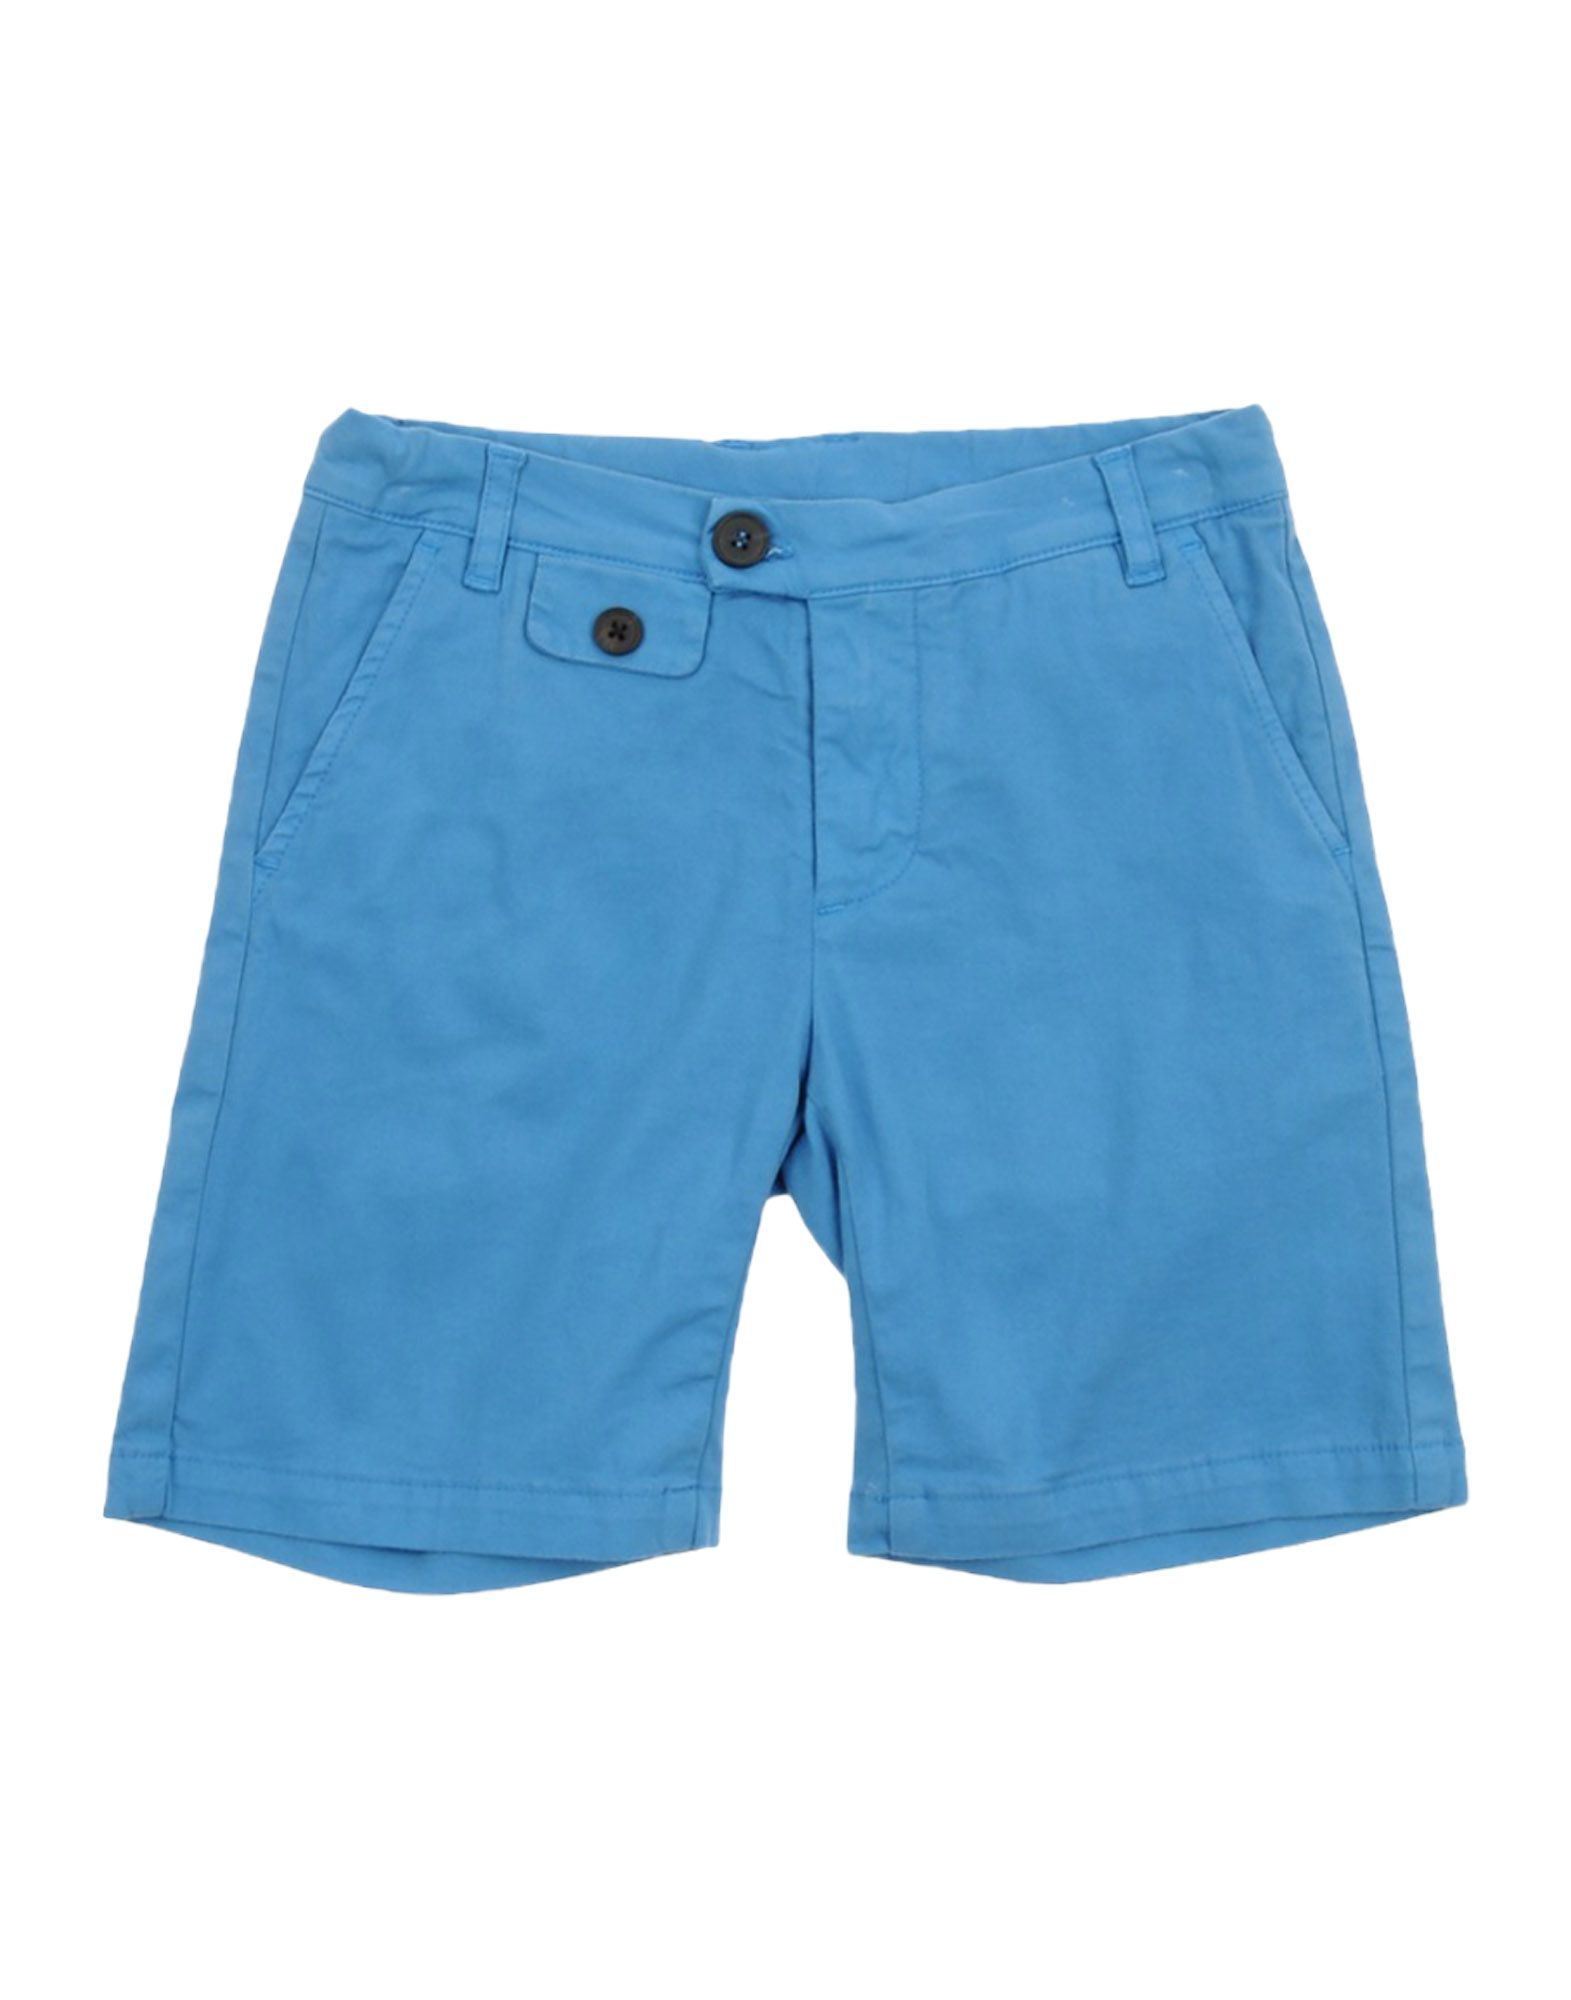 Mauro Grifoni Cotton Bermuda Shorts